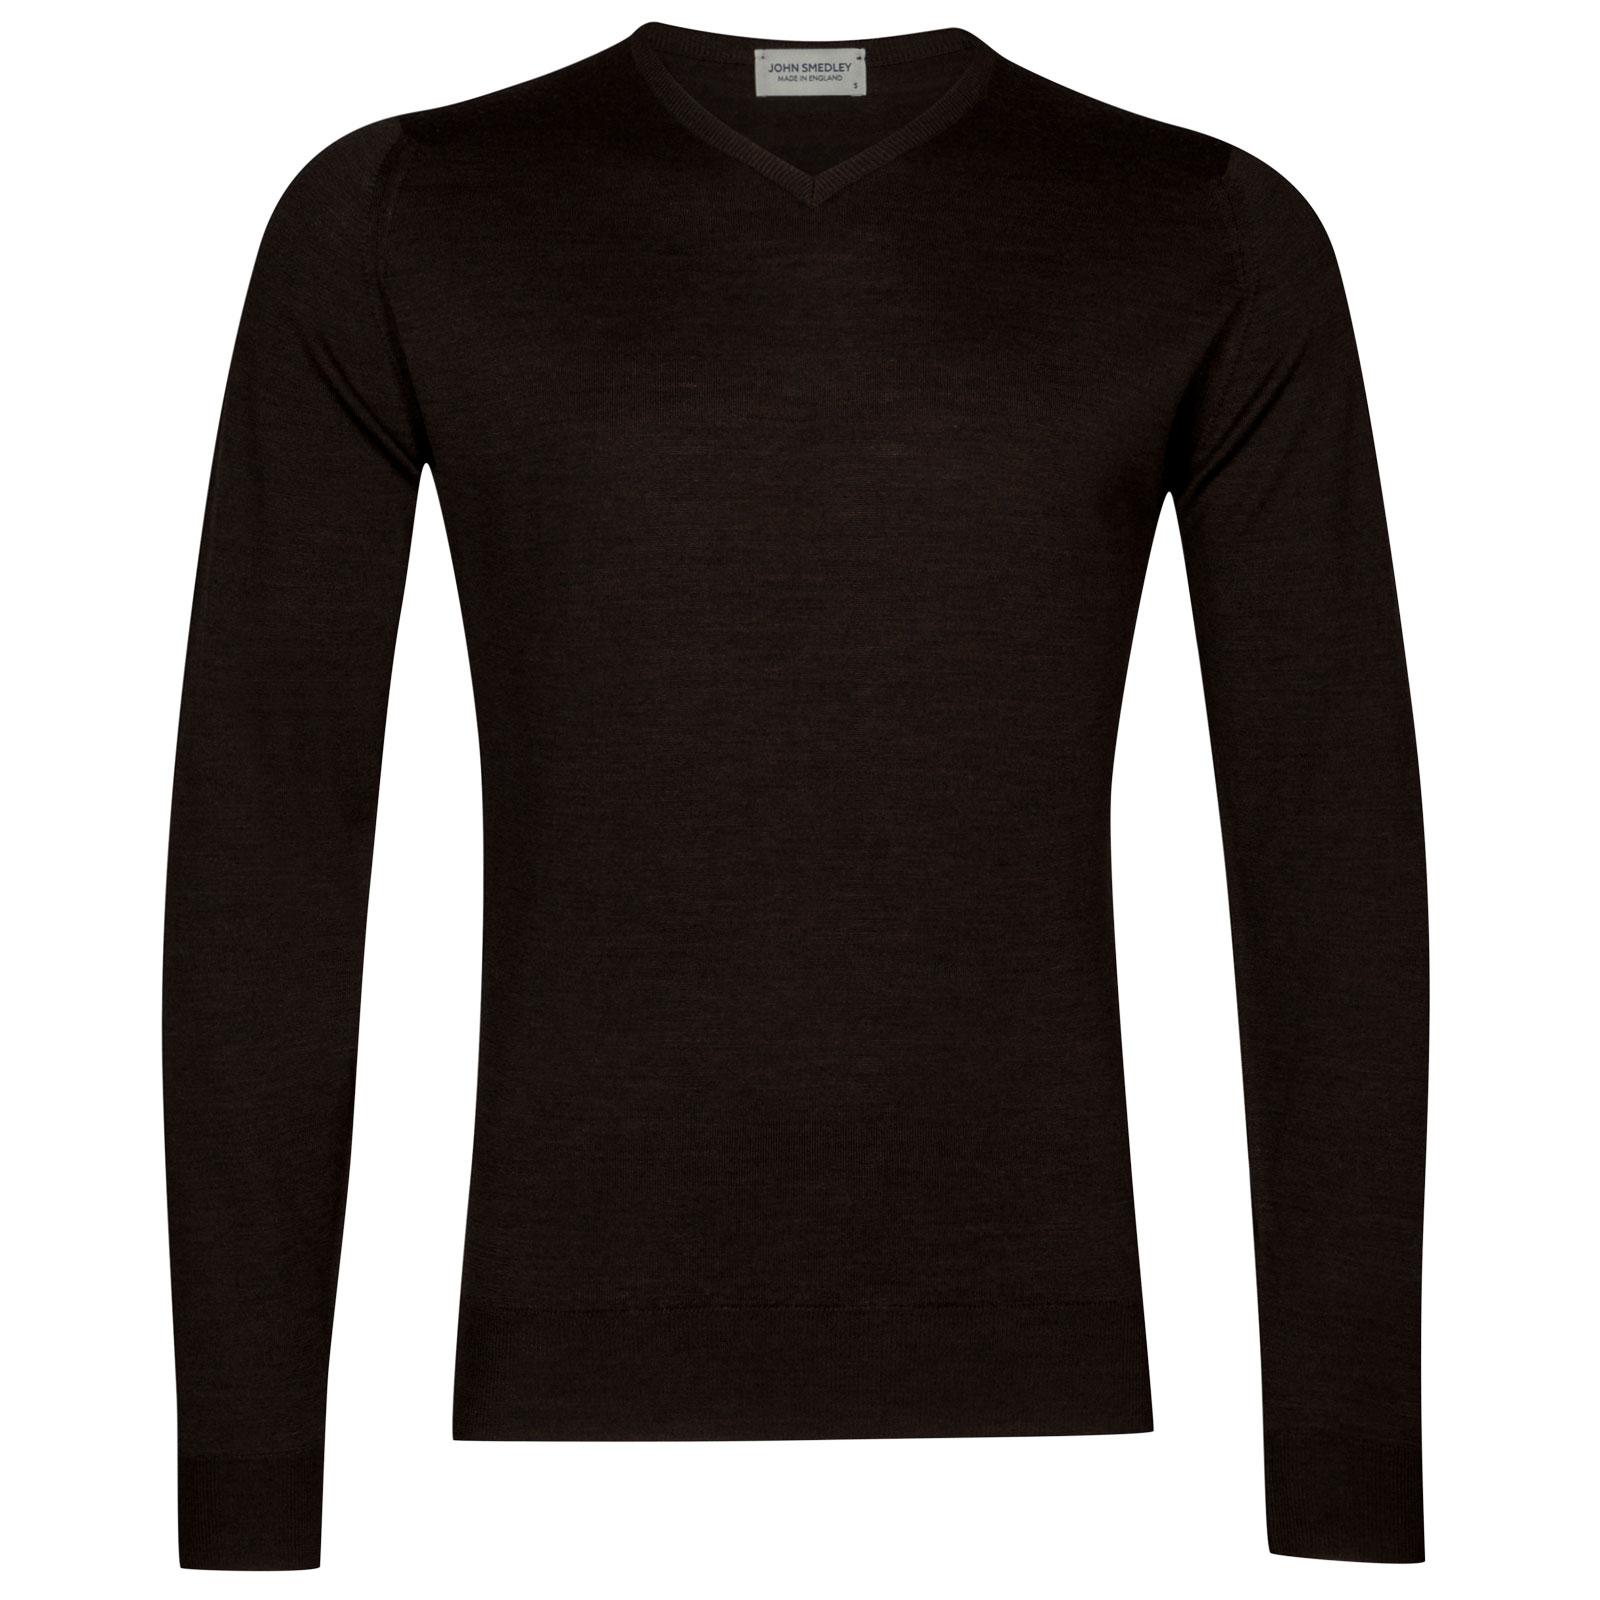 John Smedley shipton Merino Wool Pullover in Chestnut-XL